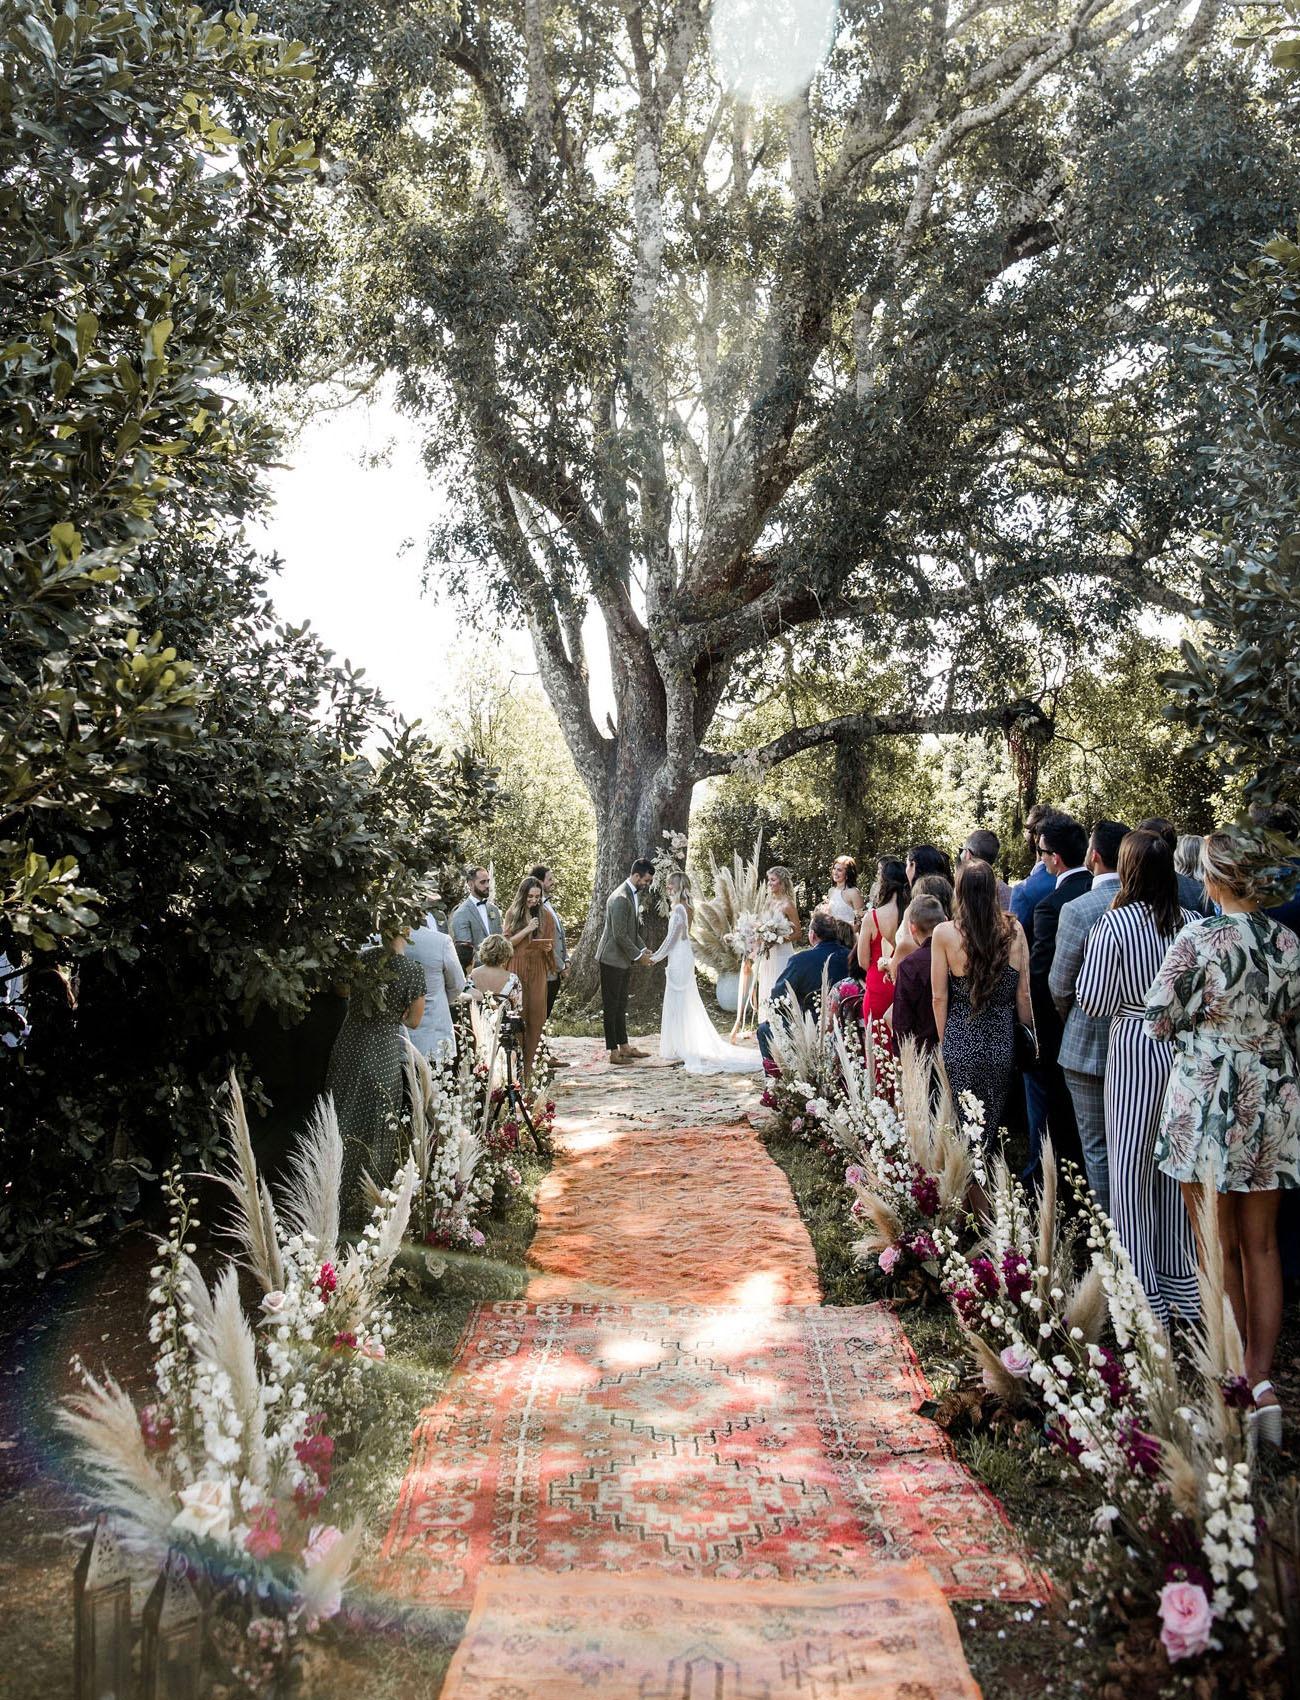 large tree serving as a DIY wedding backdrop for a backyard wedding